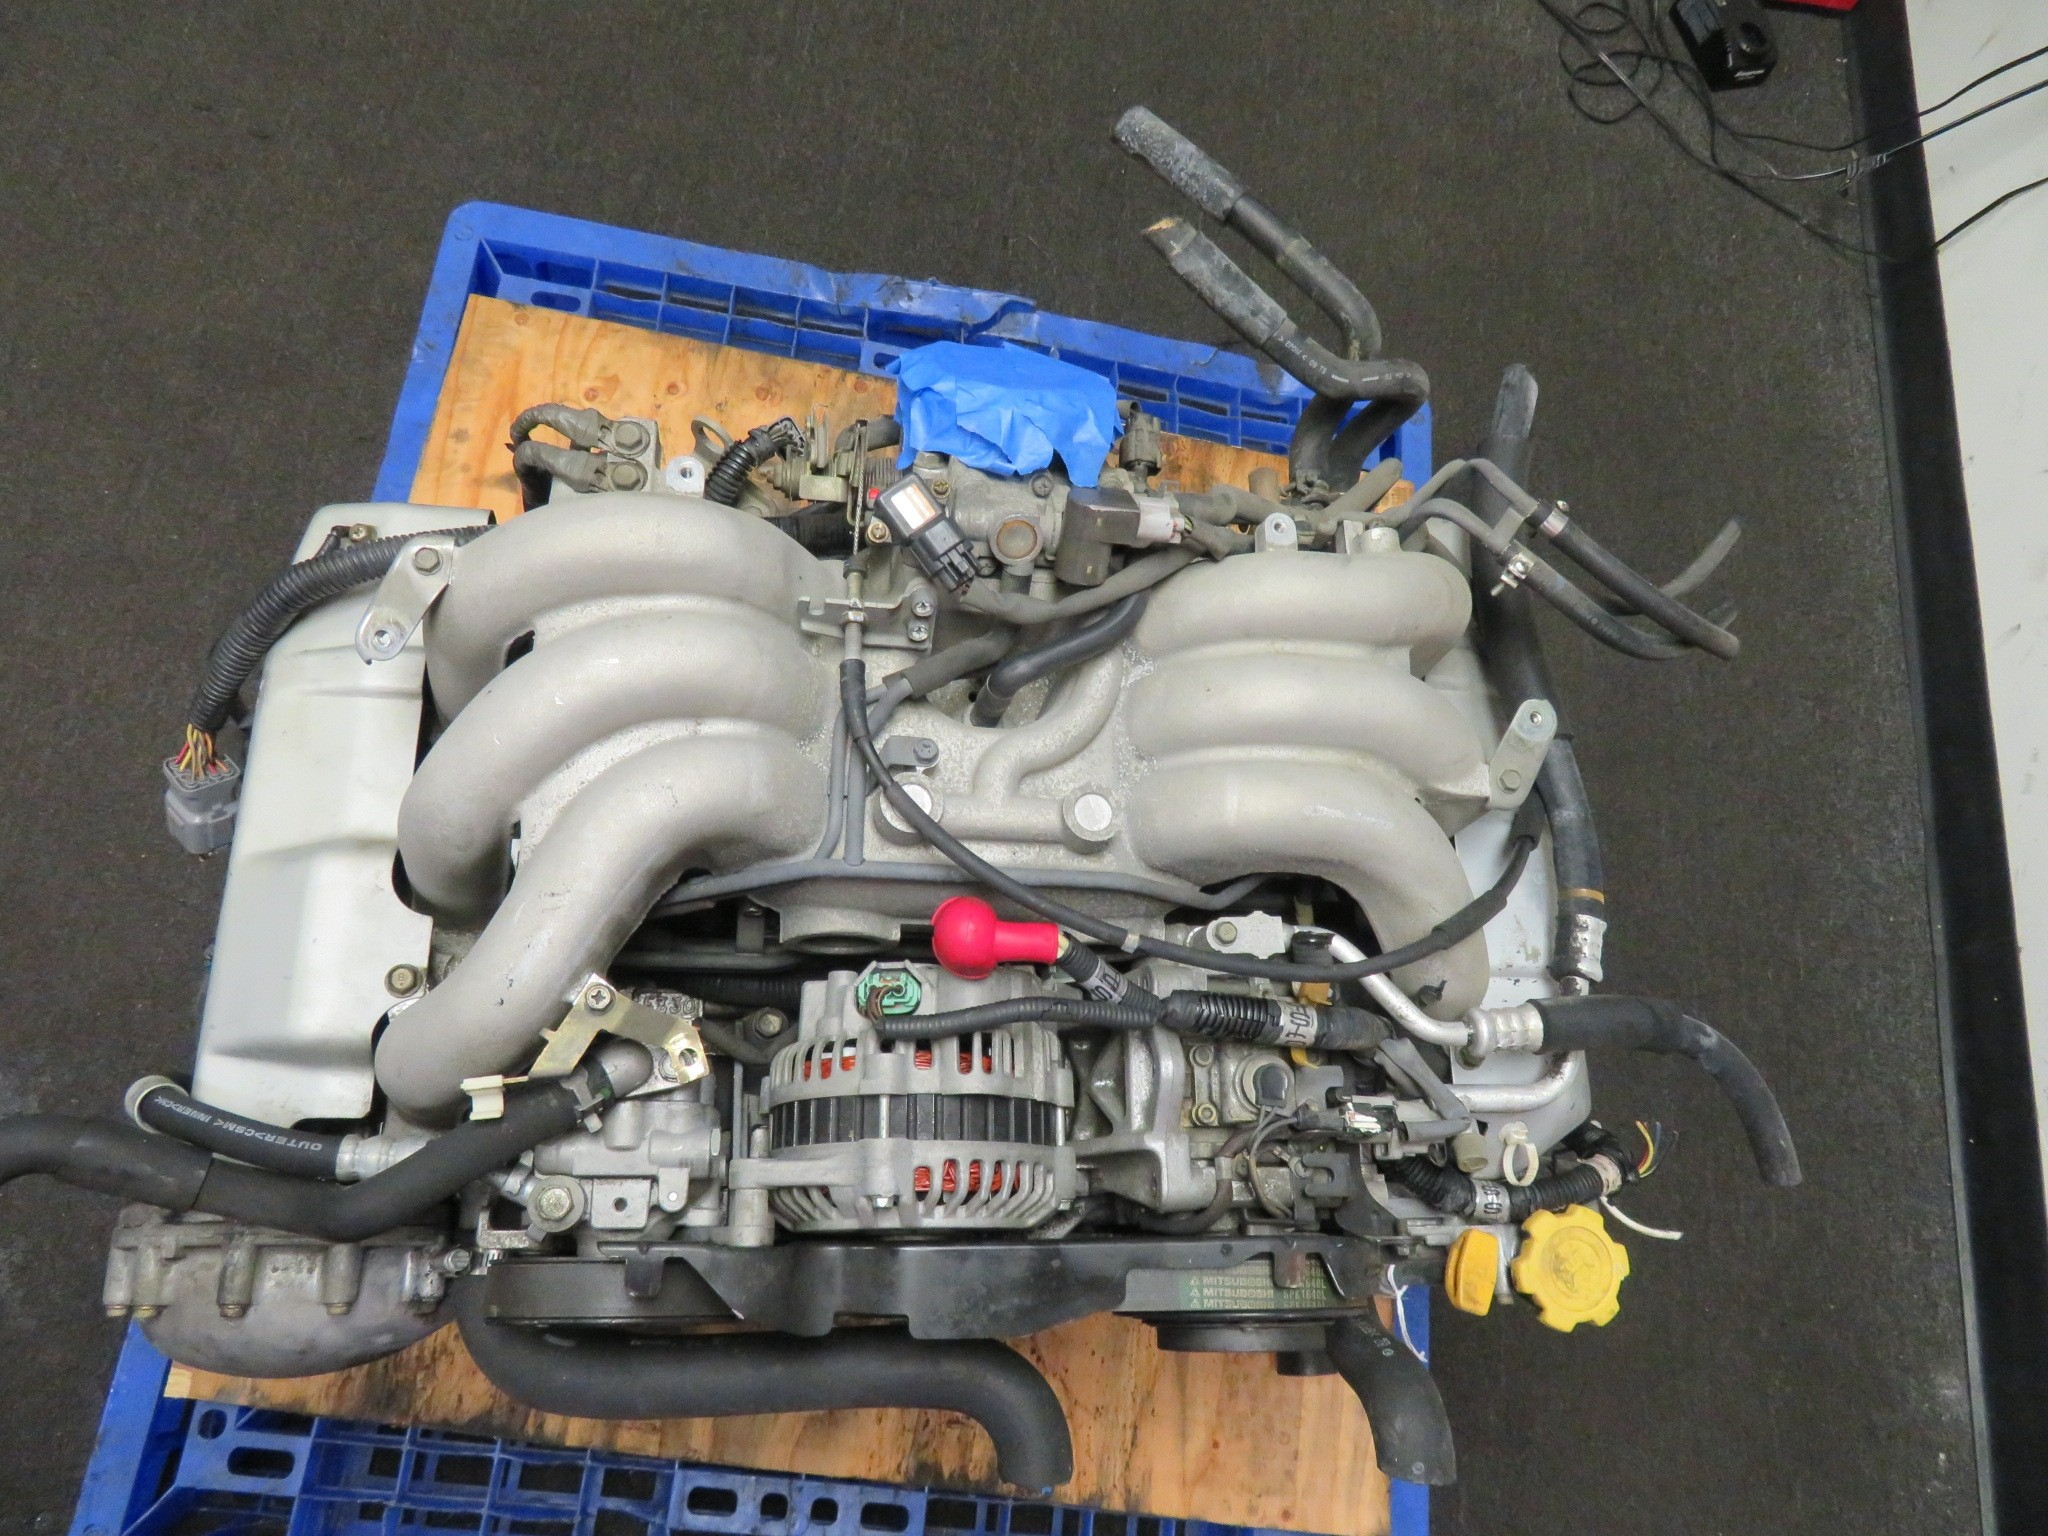 2000-2002 SUBARU EZ30 3.0L H6 6 CYLINDER ENGINE, OUTBACK LEGACY TRIBECA